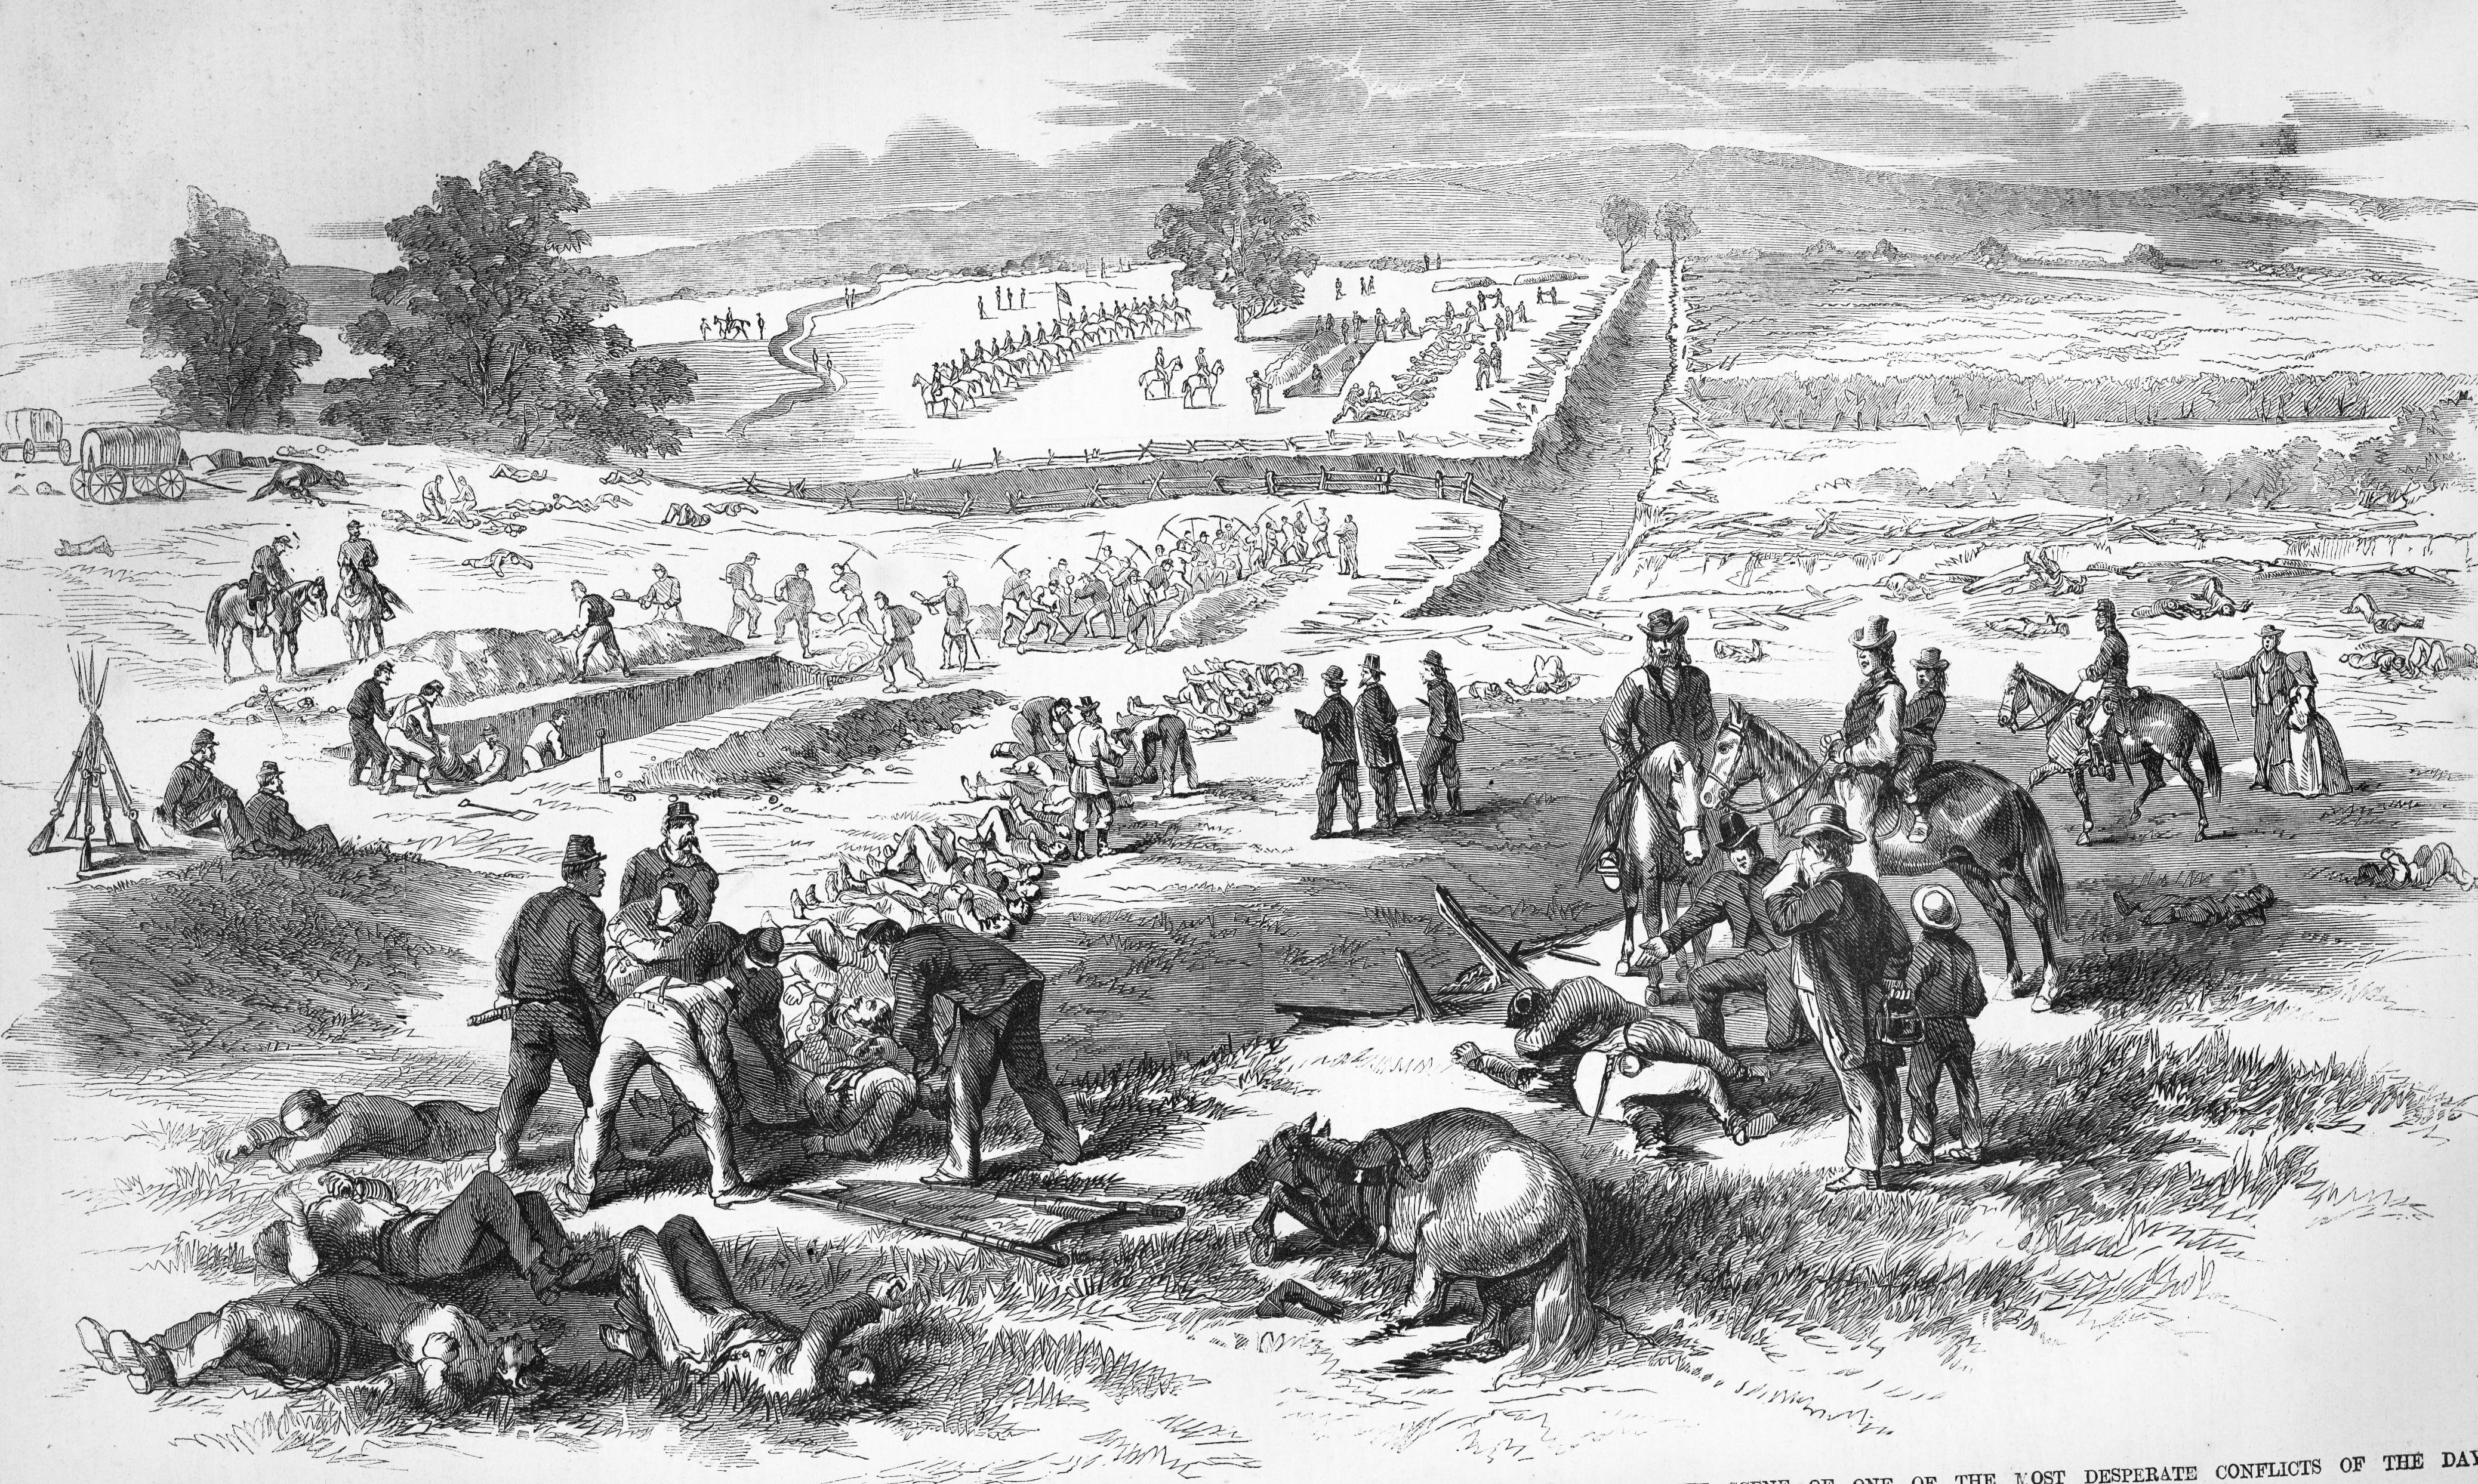 CIVIL WAR 1861 SANDY HOOK COLONEL STONE HEADQUARTERS UPPER POTOMAC HORSE WAGONS